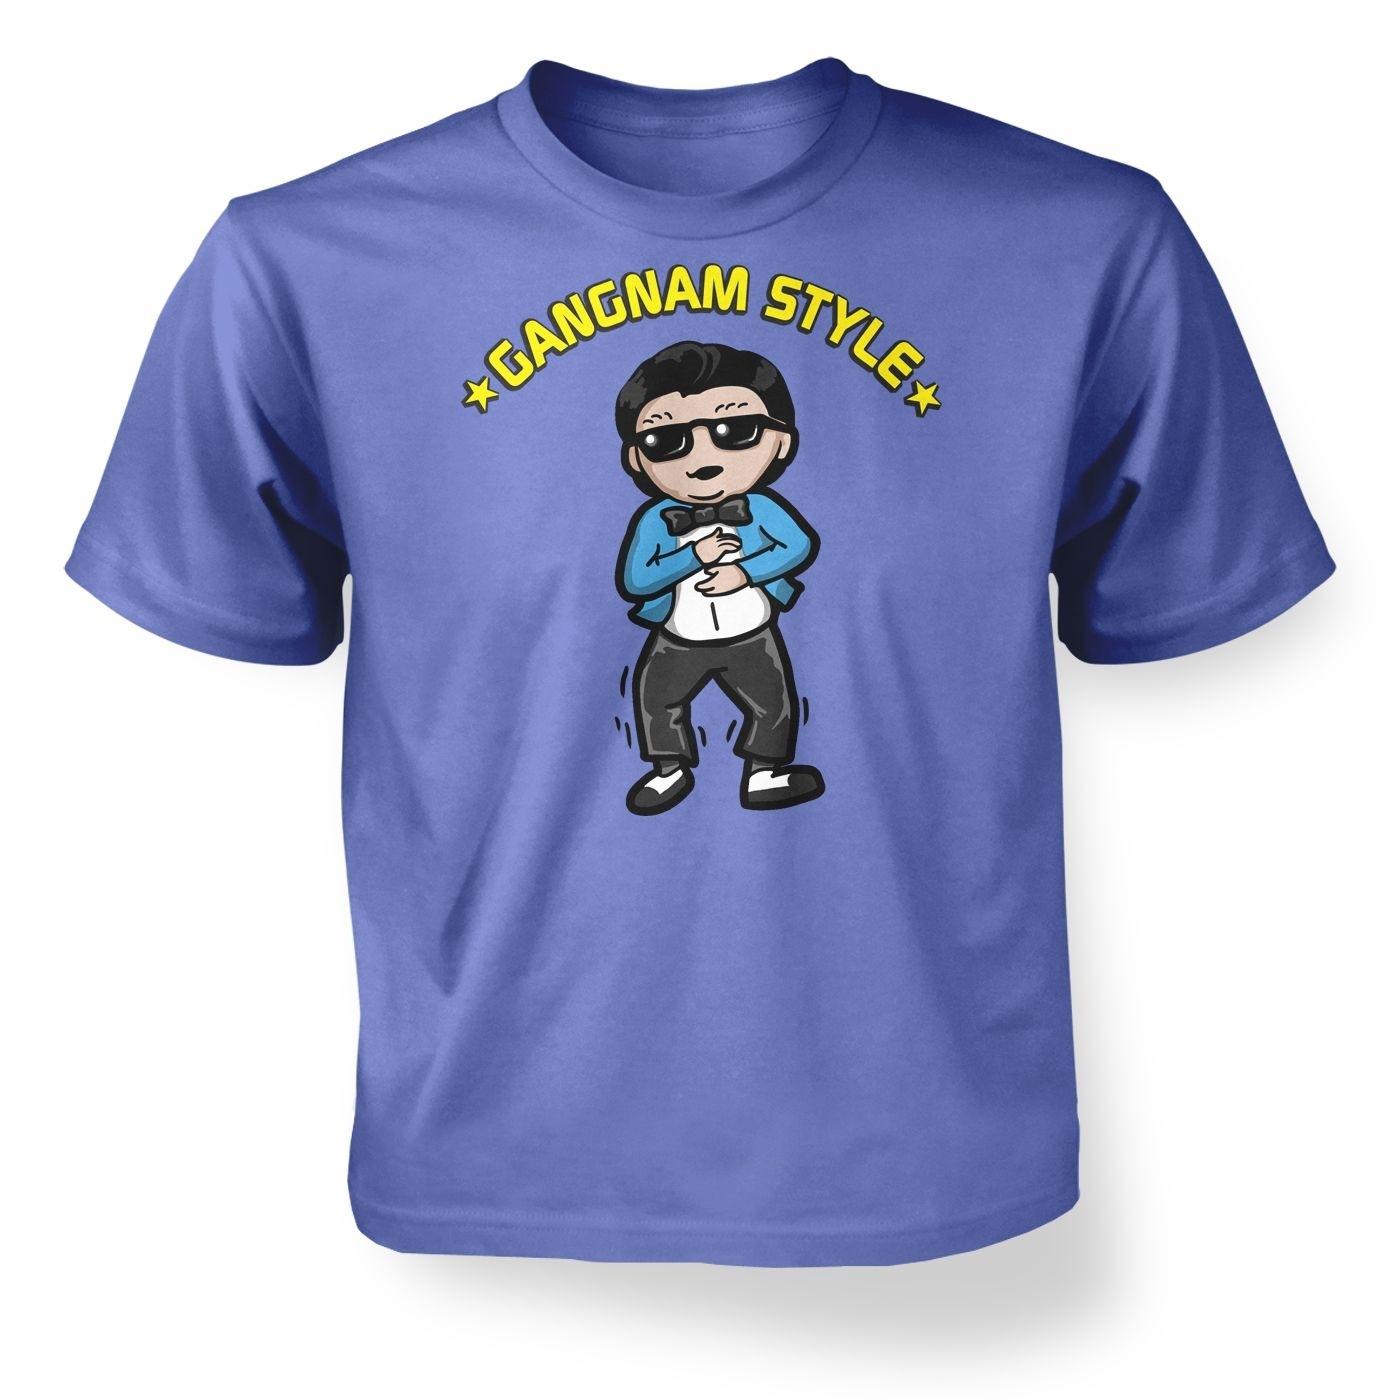 Gangnam Style kid's t-shirt